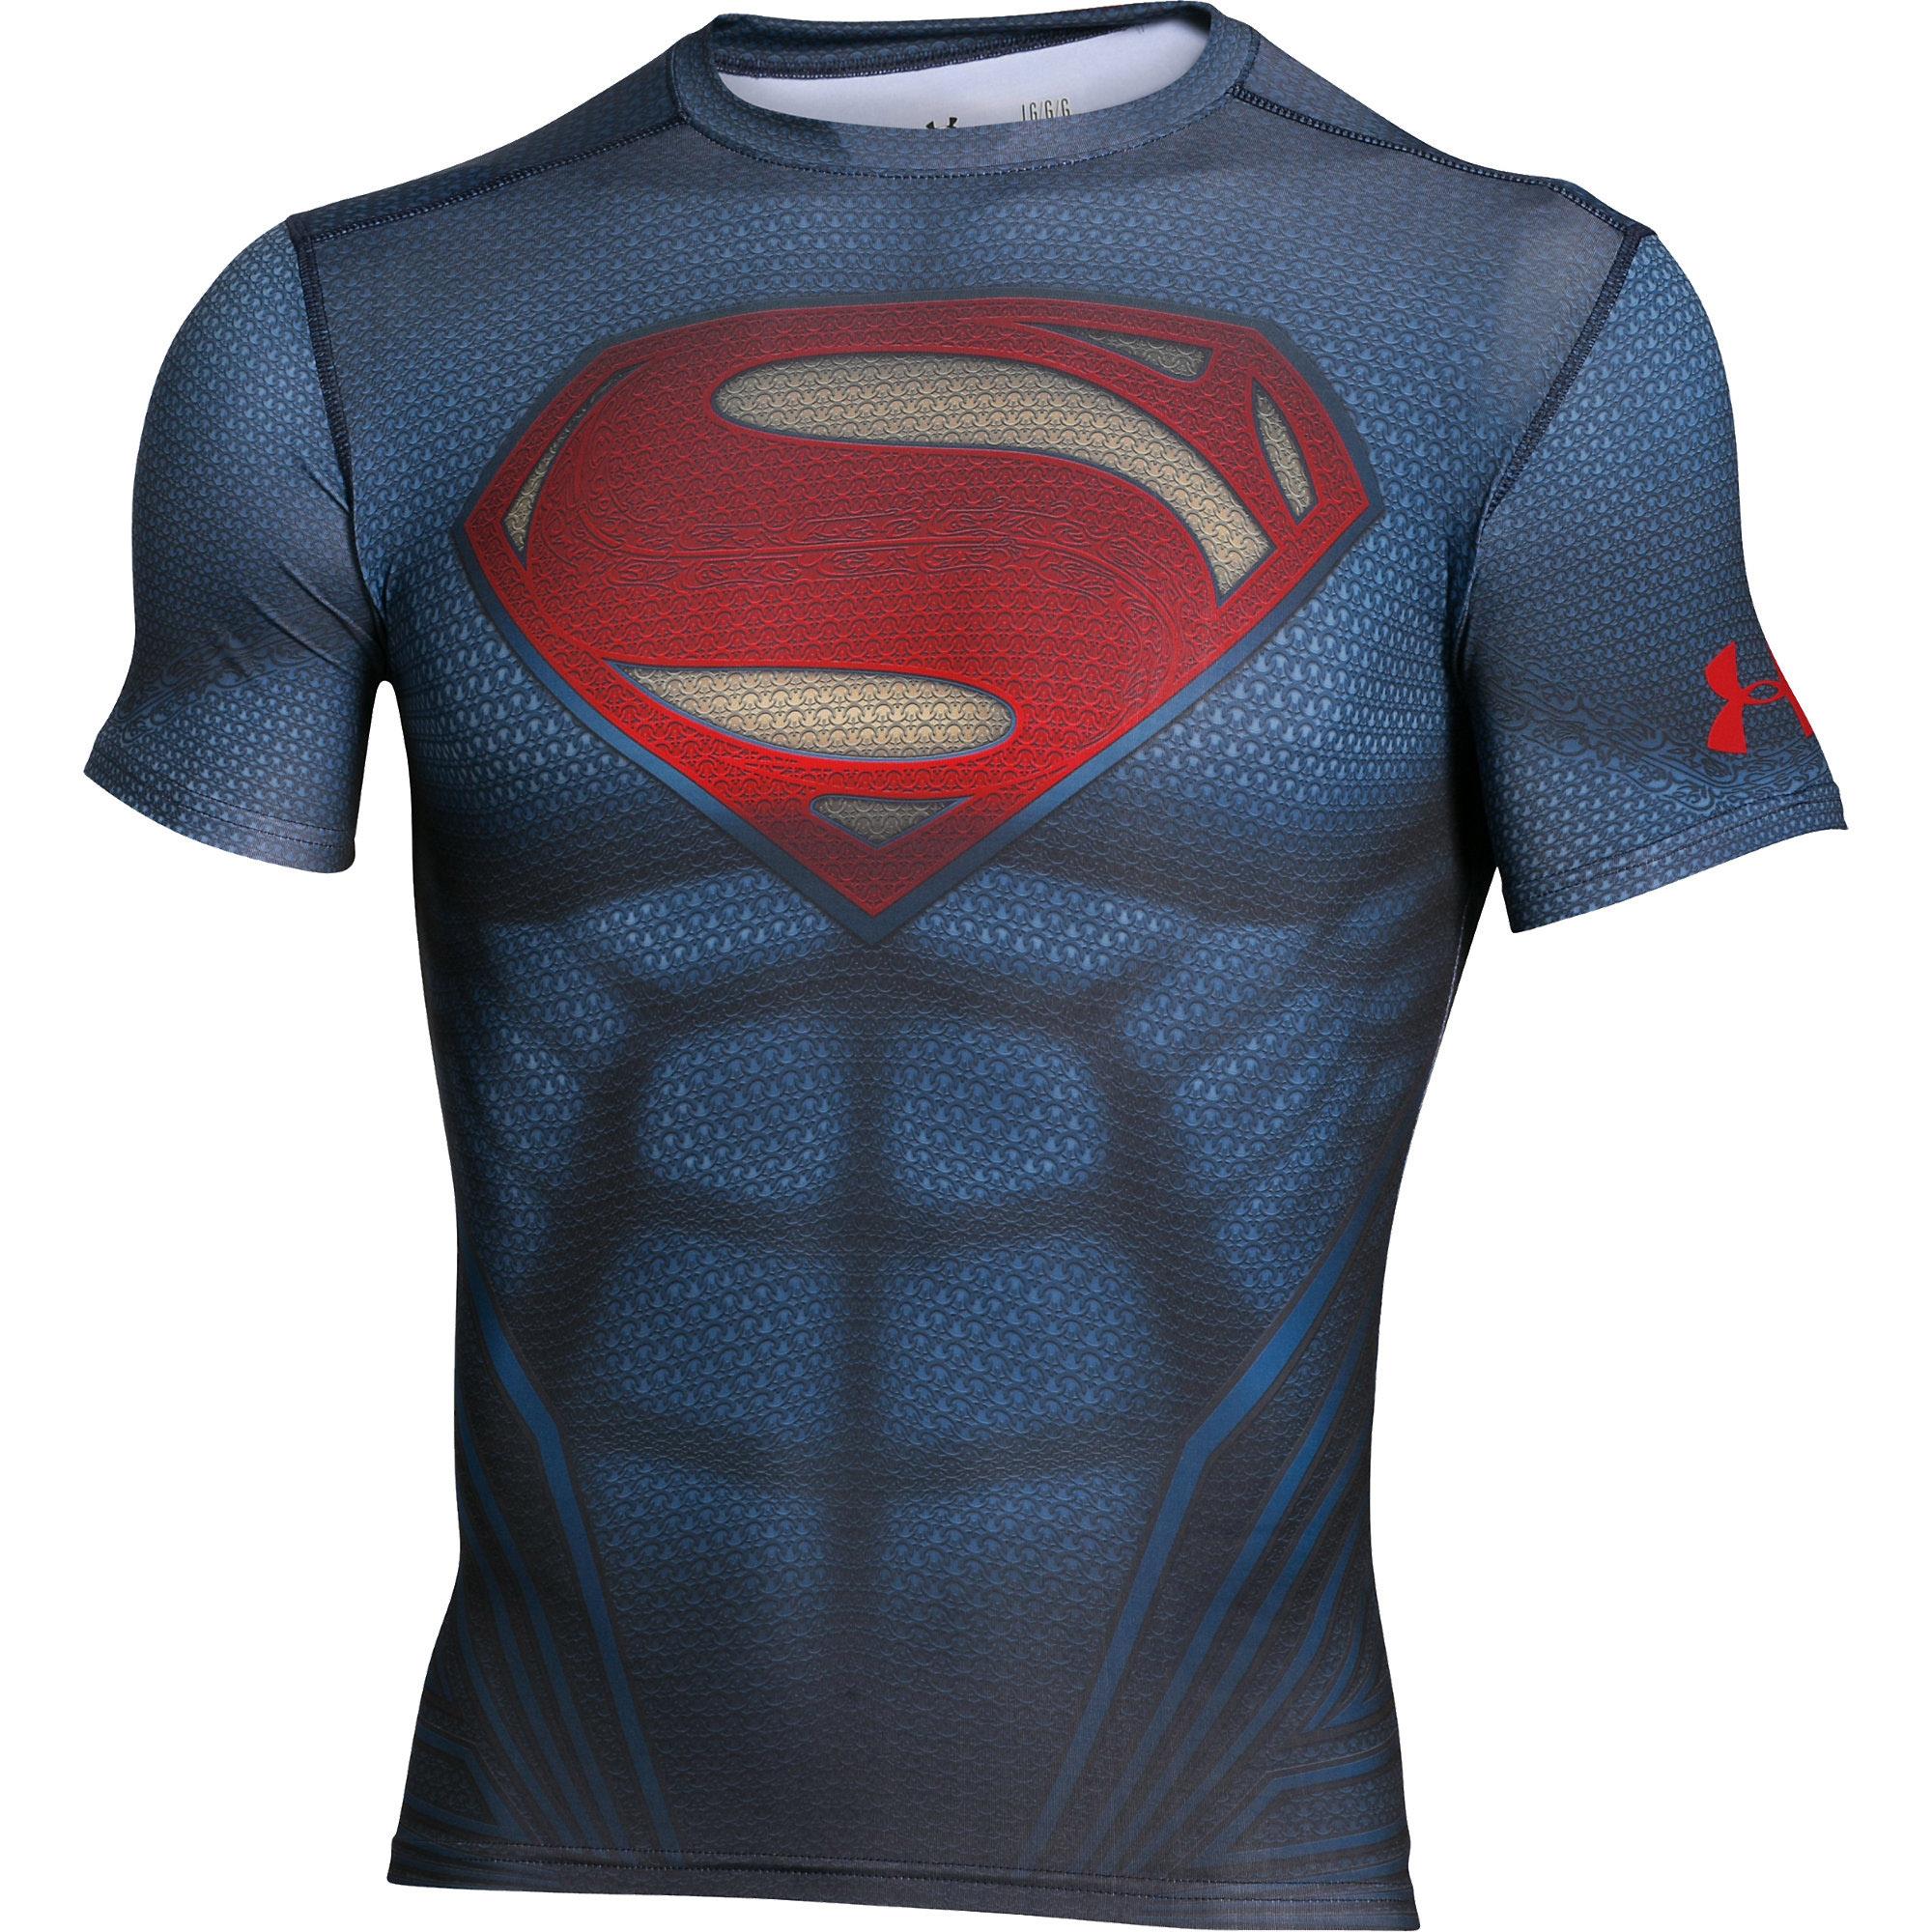 Under Armor Shirt Design